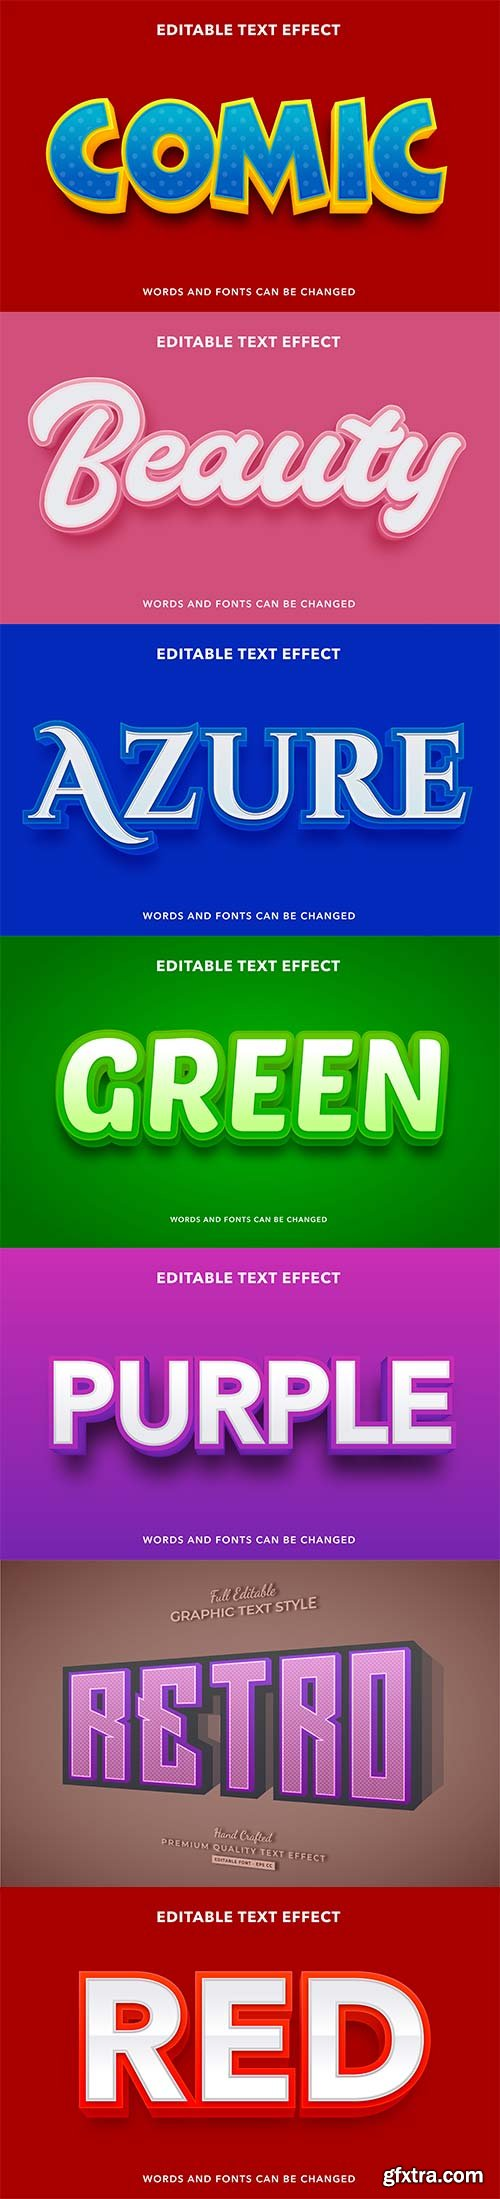 3d editable text style effect vector vol 247